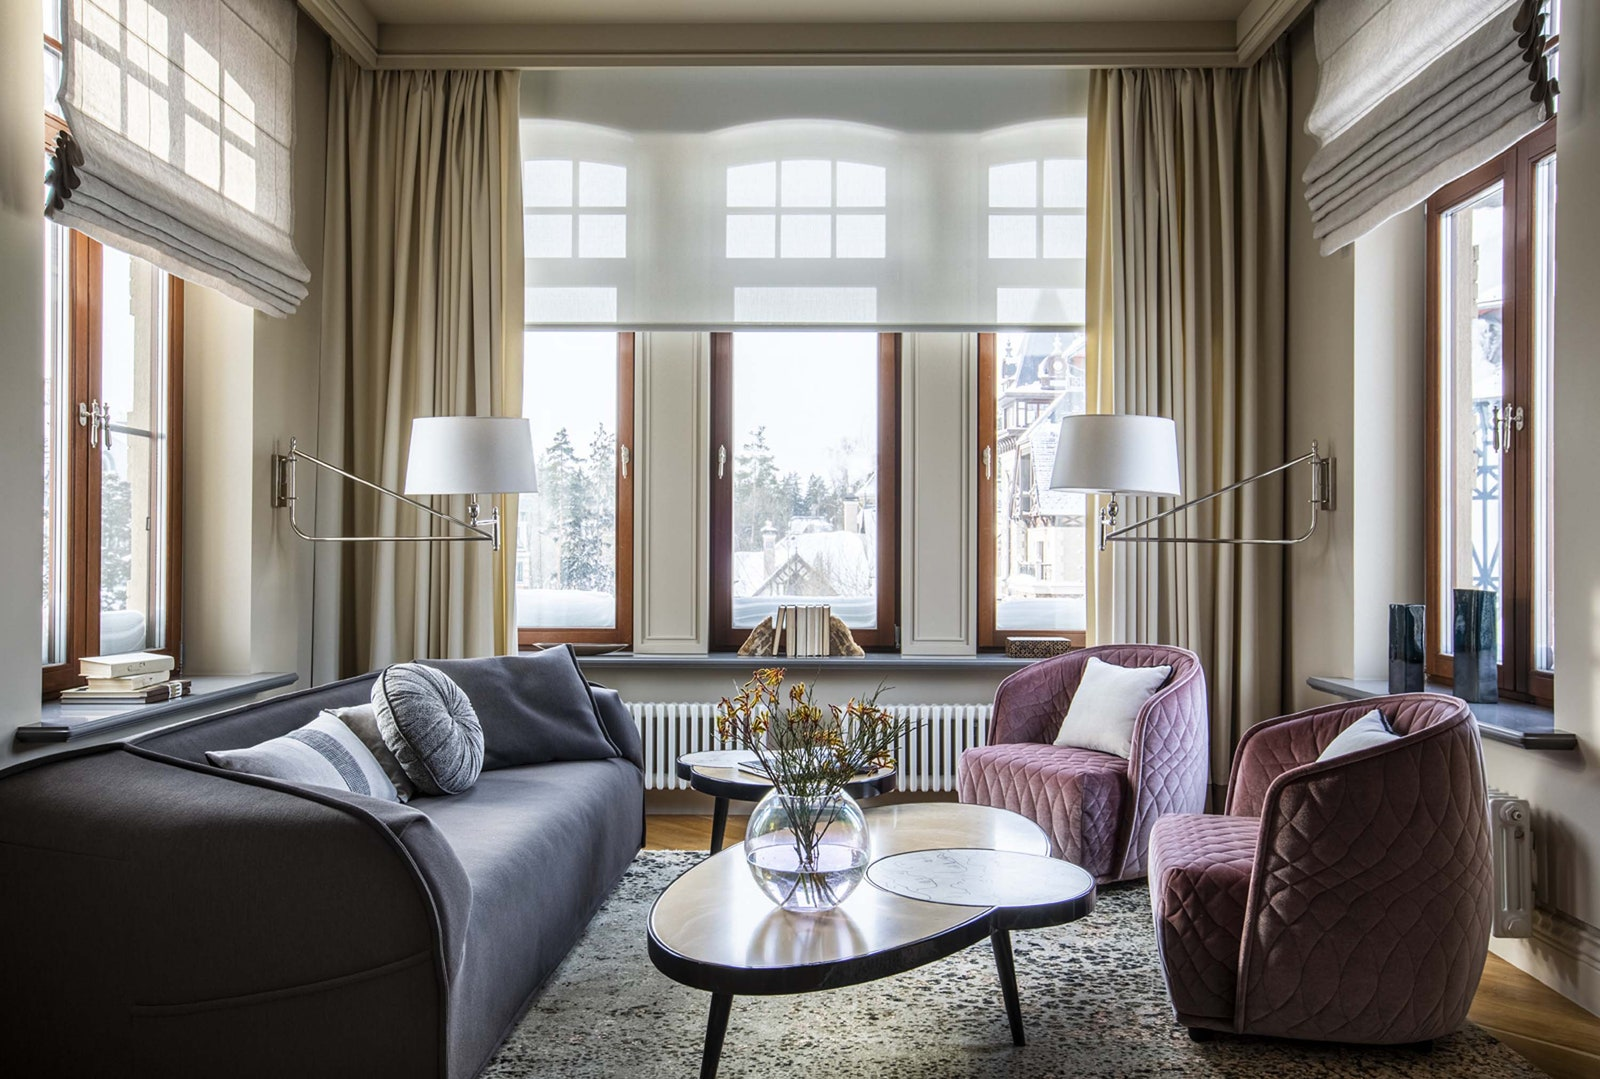 .    Moroso       Roche Bobois       Visual Comfort amp Co.  Designboom  Loffilab  Design Carpets  Benjamin Moore.